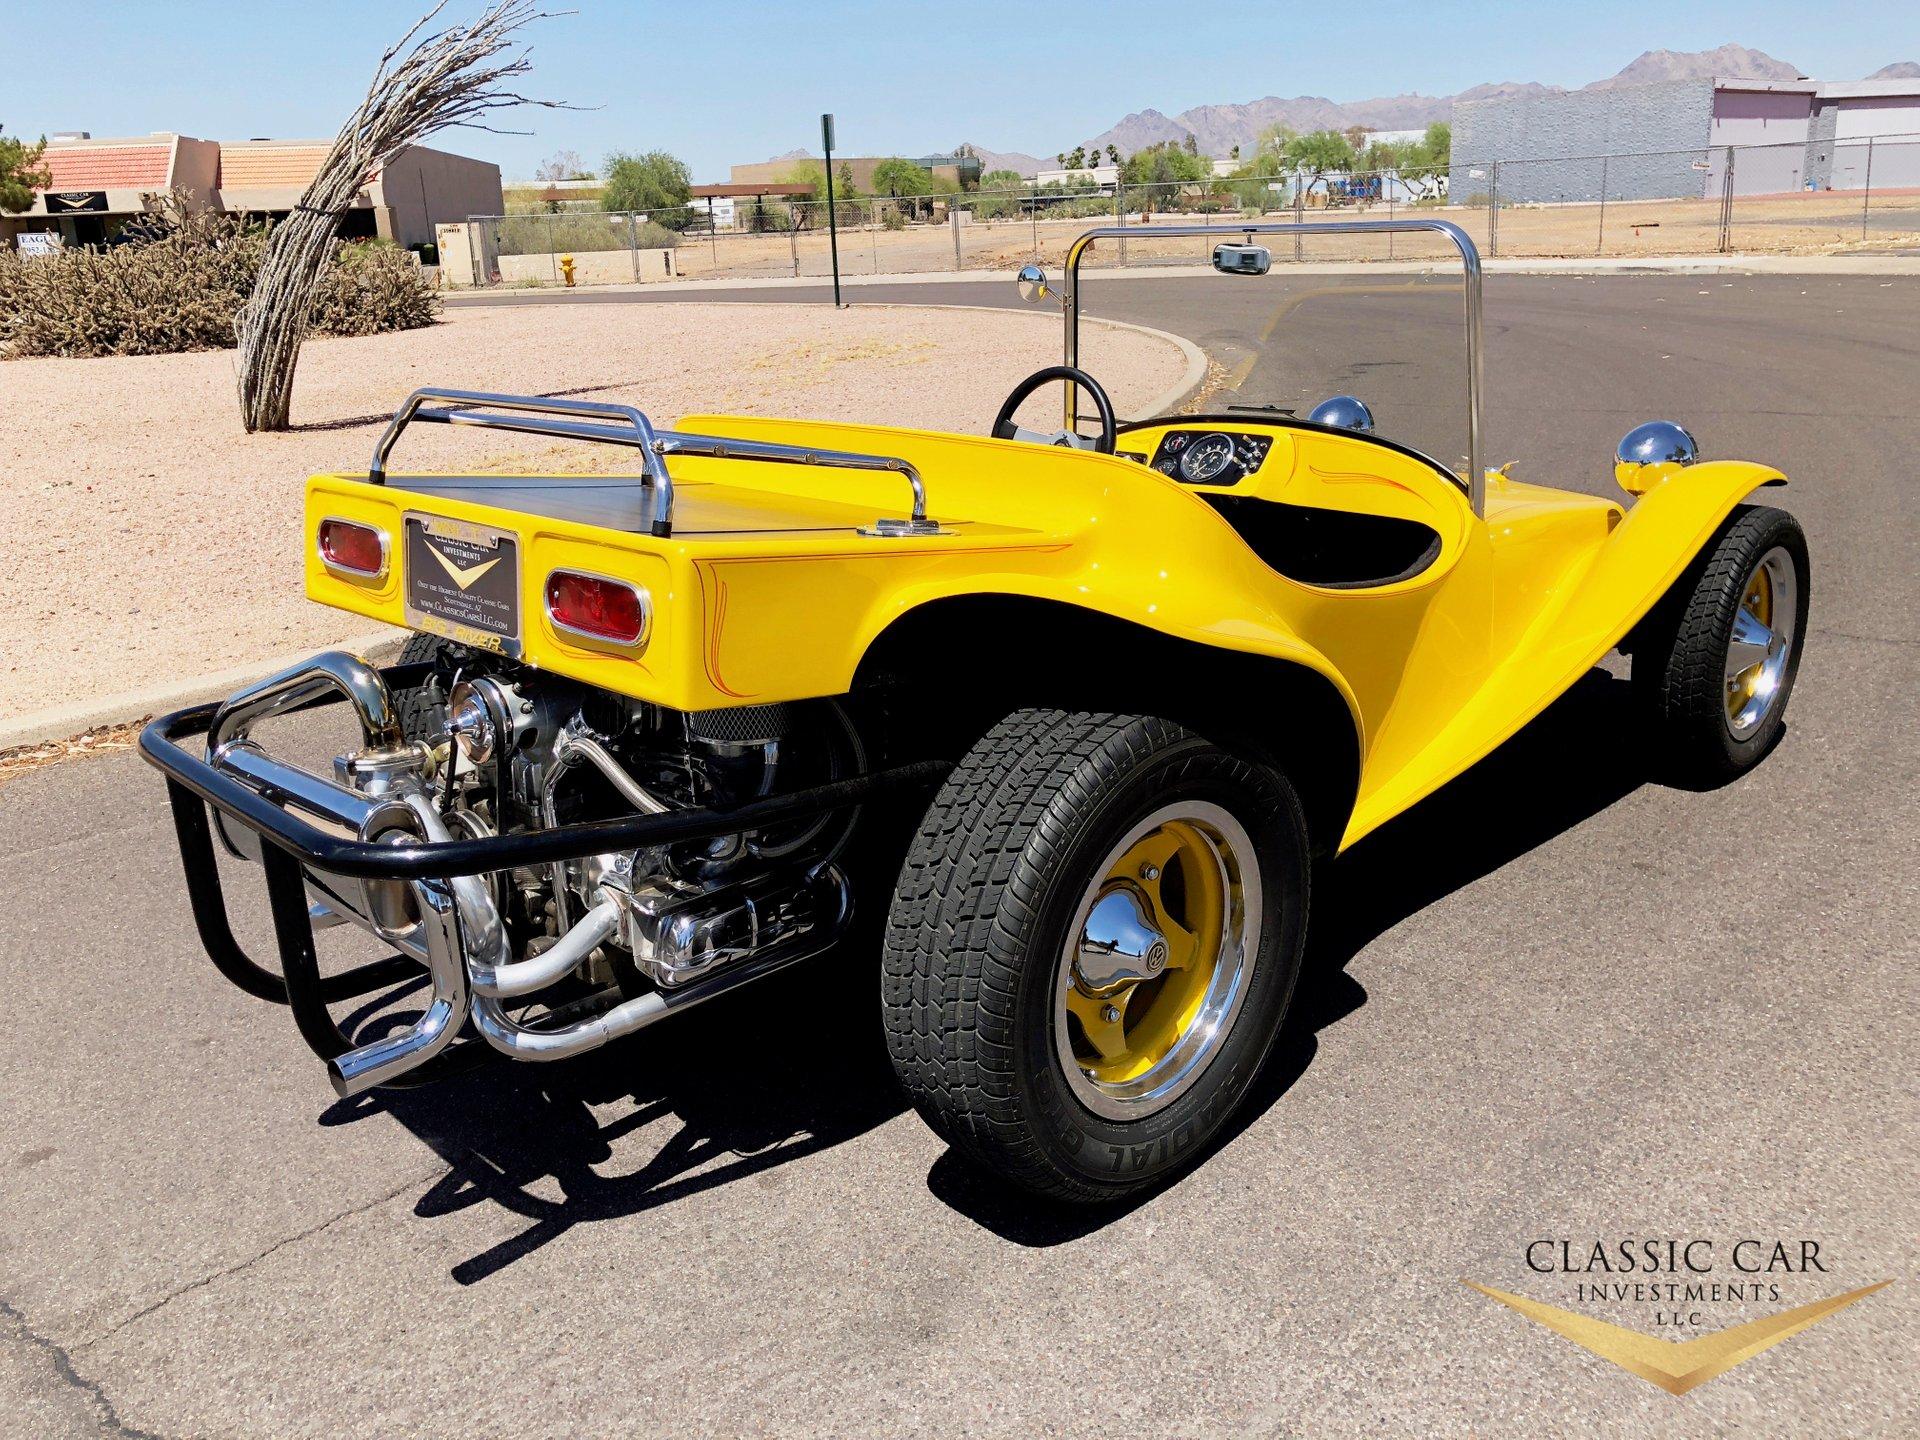 1969 Berry Mini T Dune Buggy | Classic Car Investments, LLC